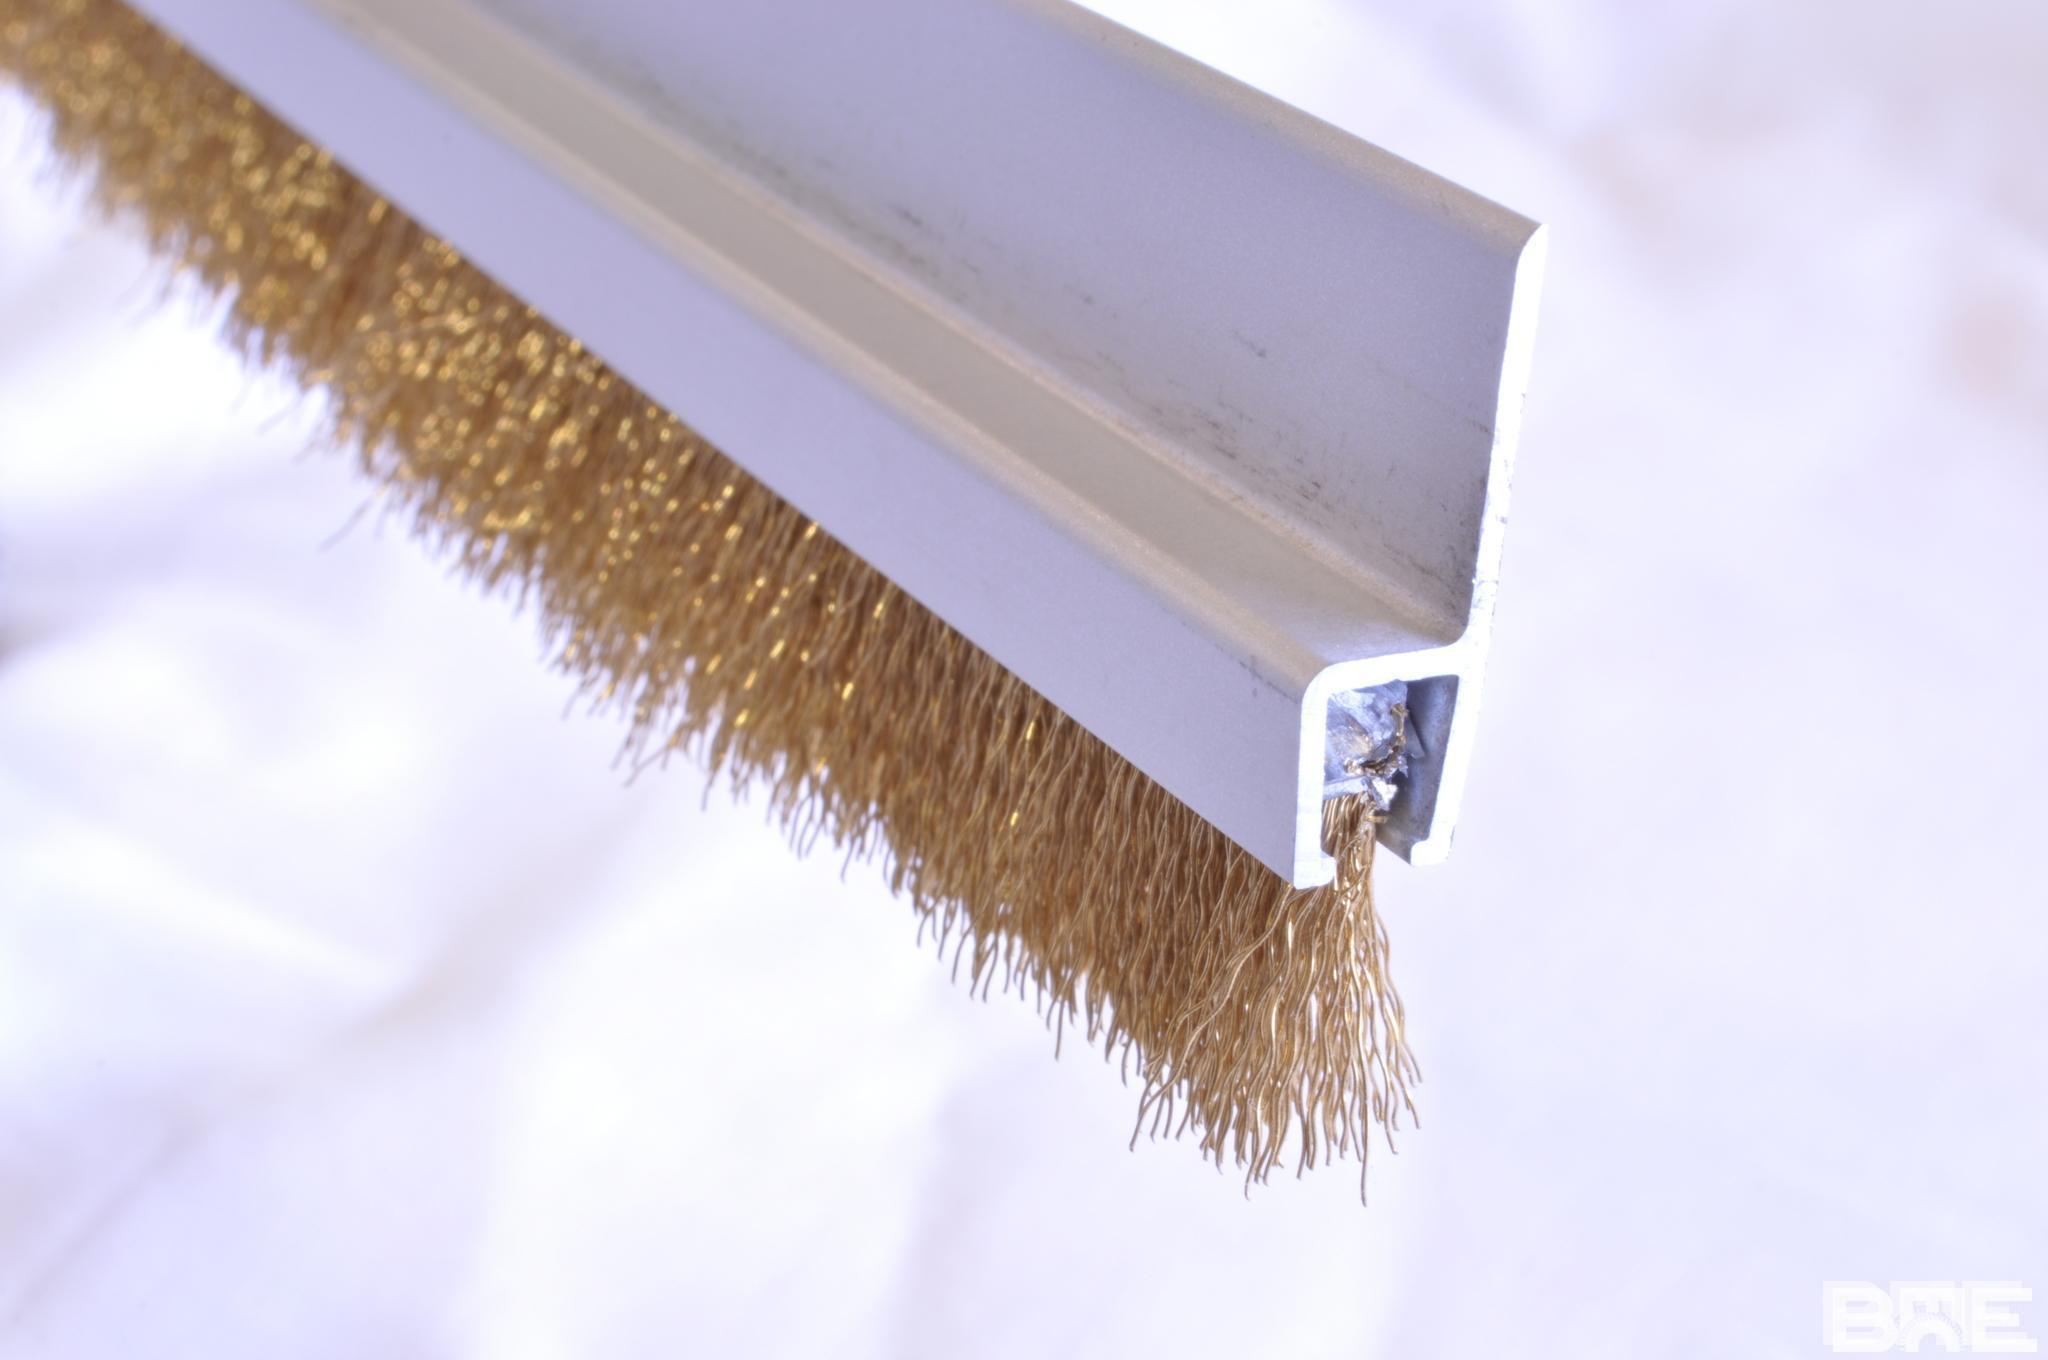 Brosse strip monture h en aluminium et fibre laiton